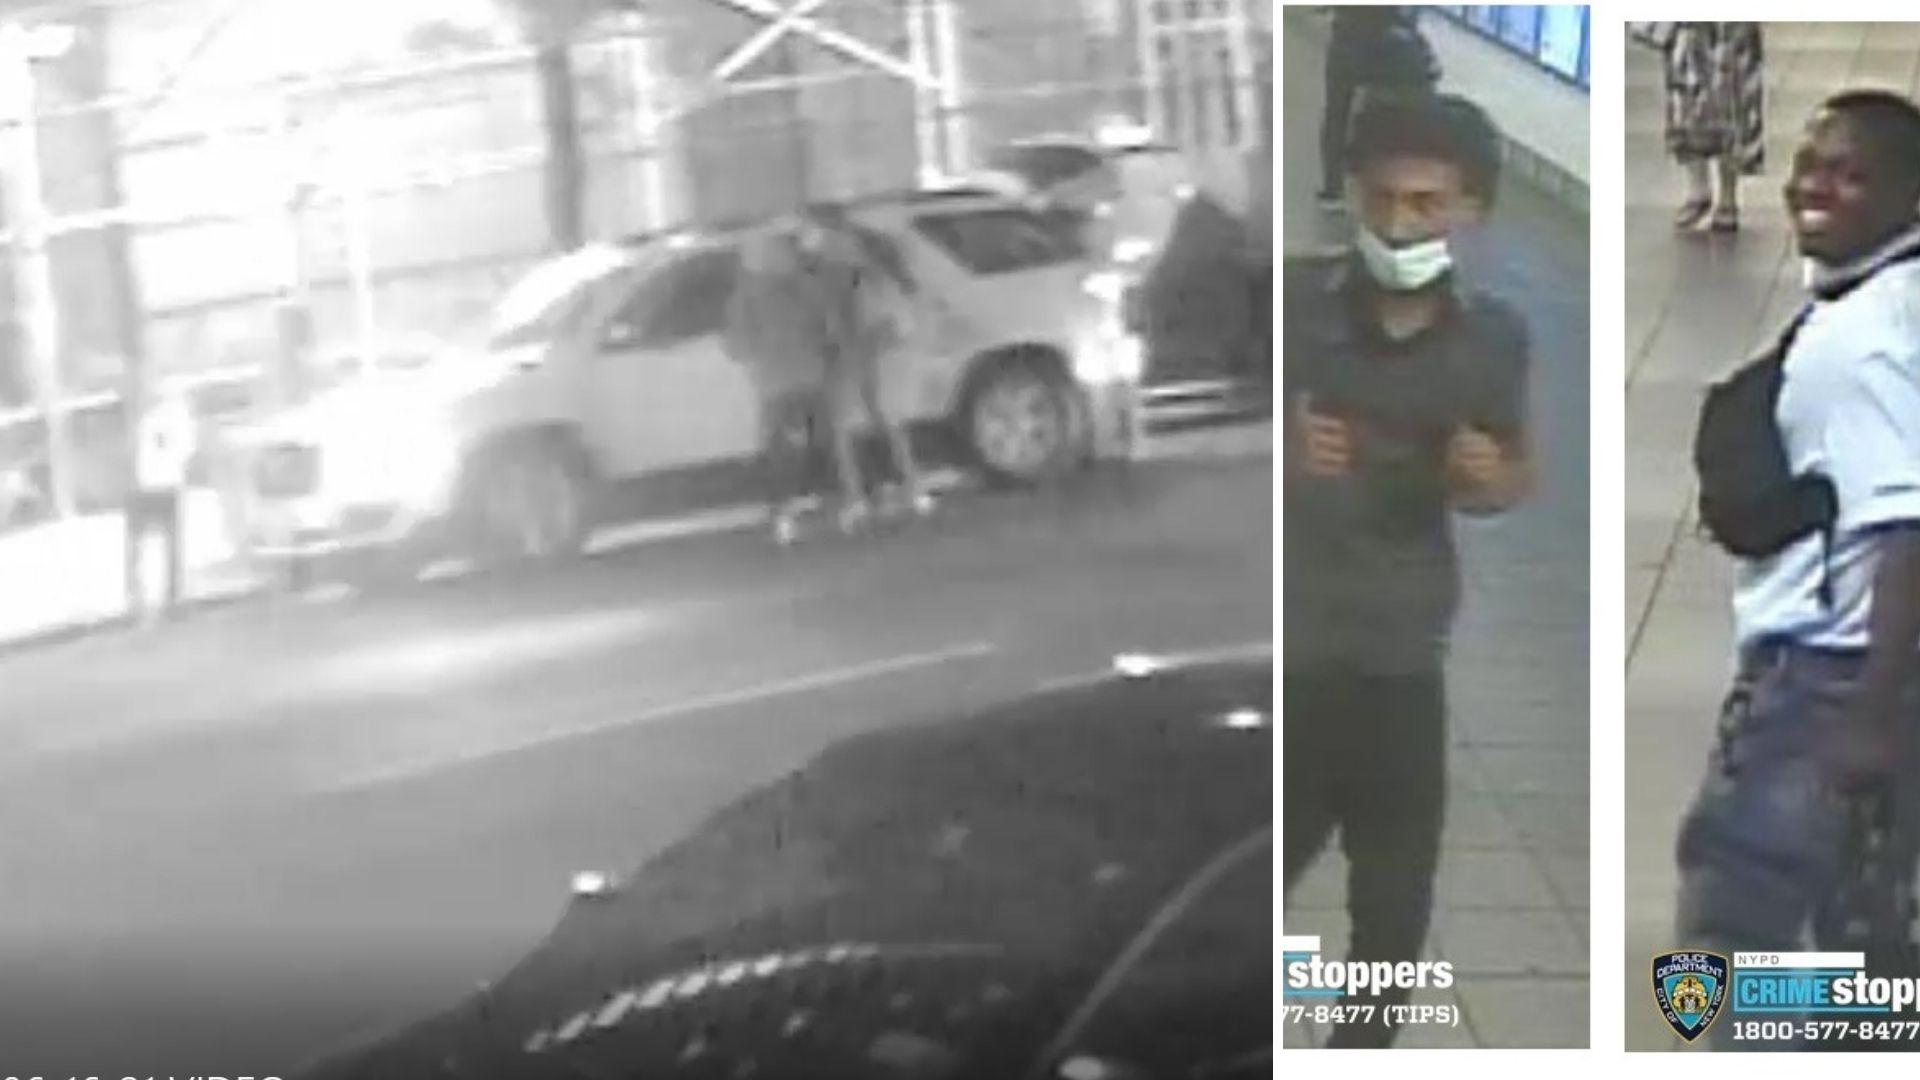 Manhattan SUV theft